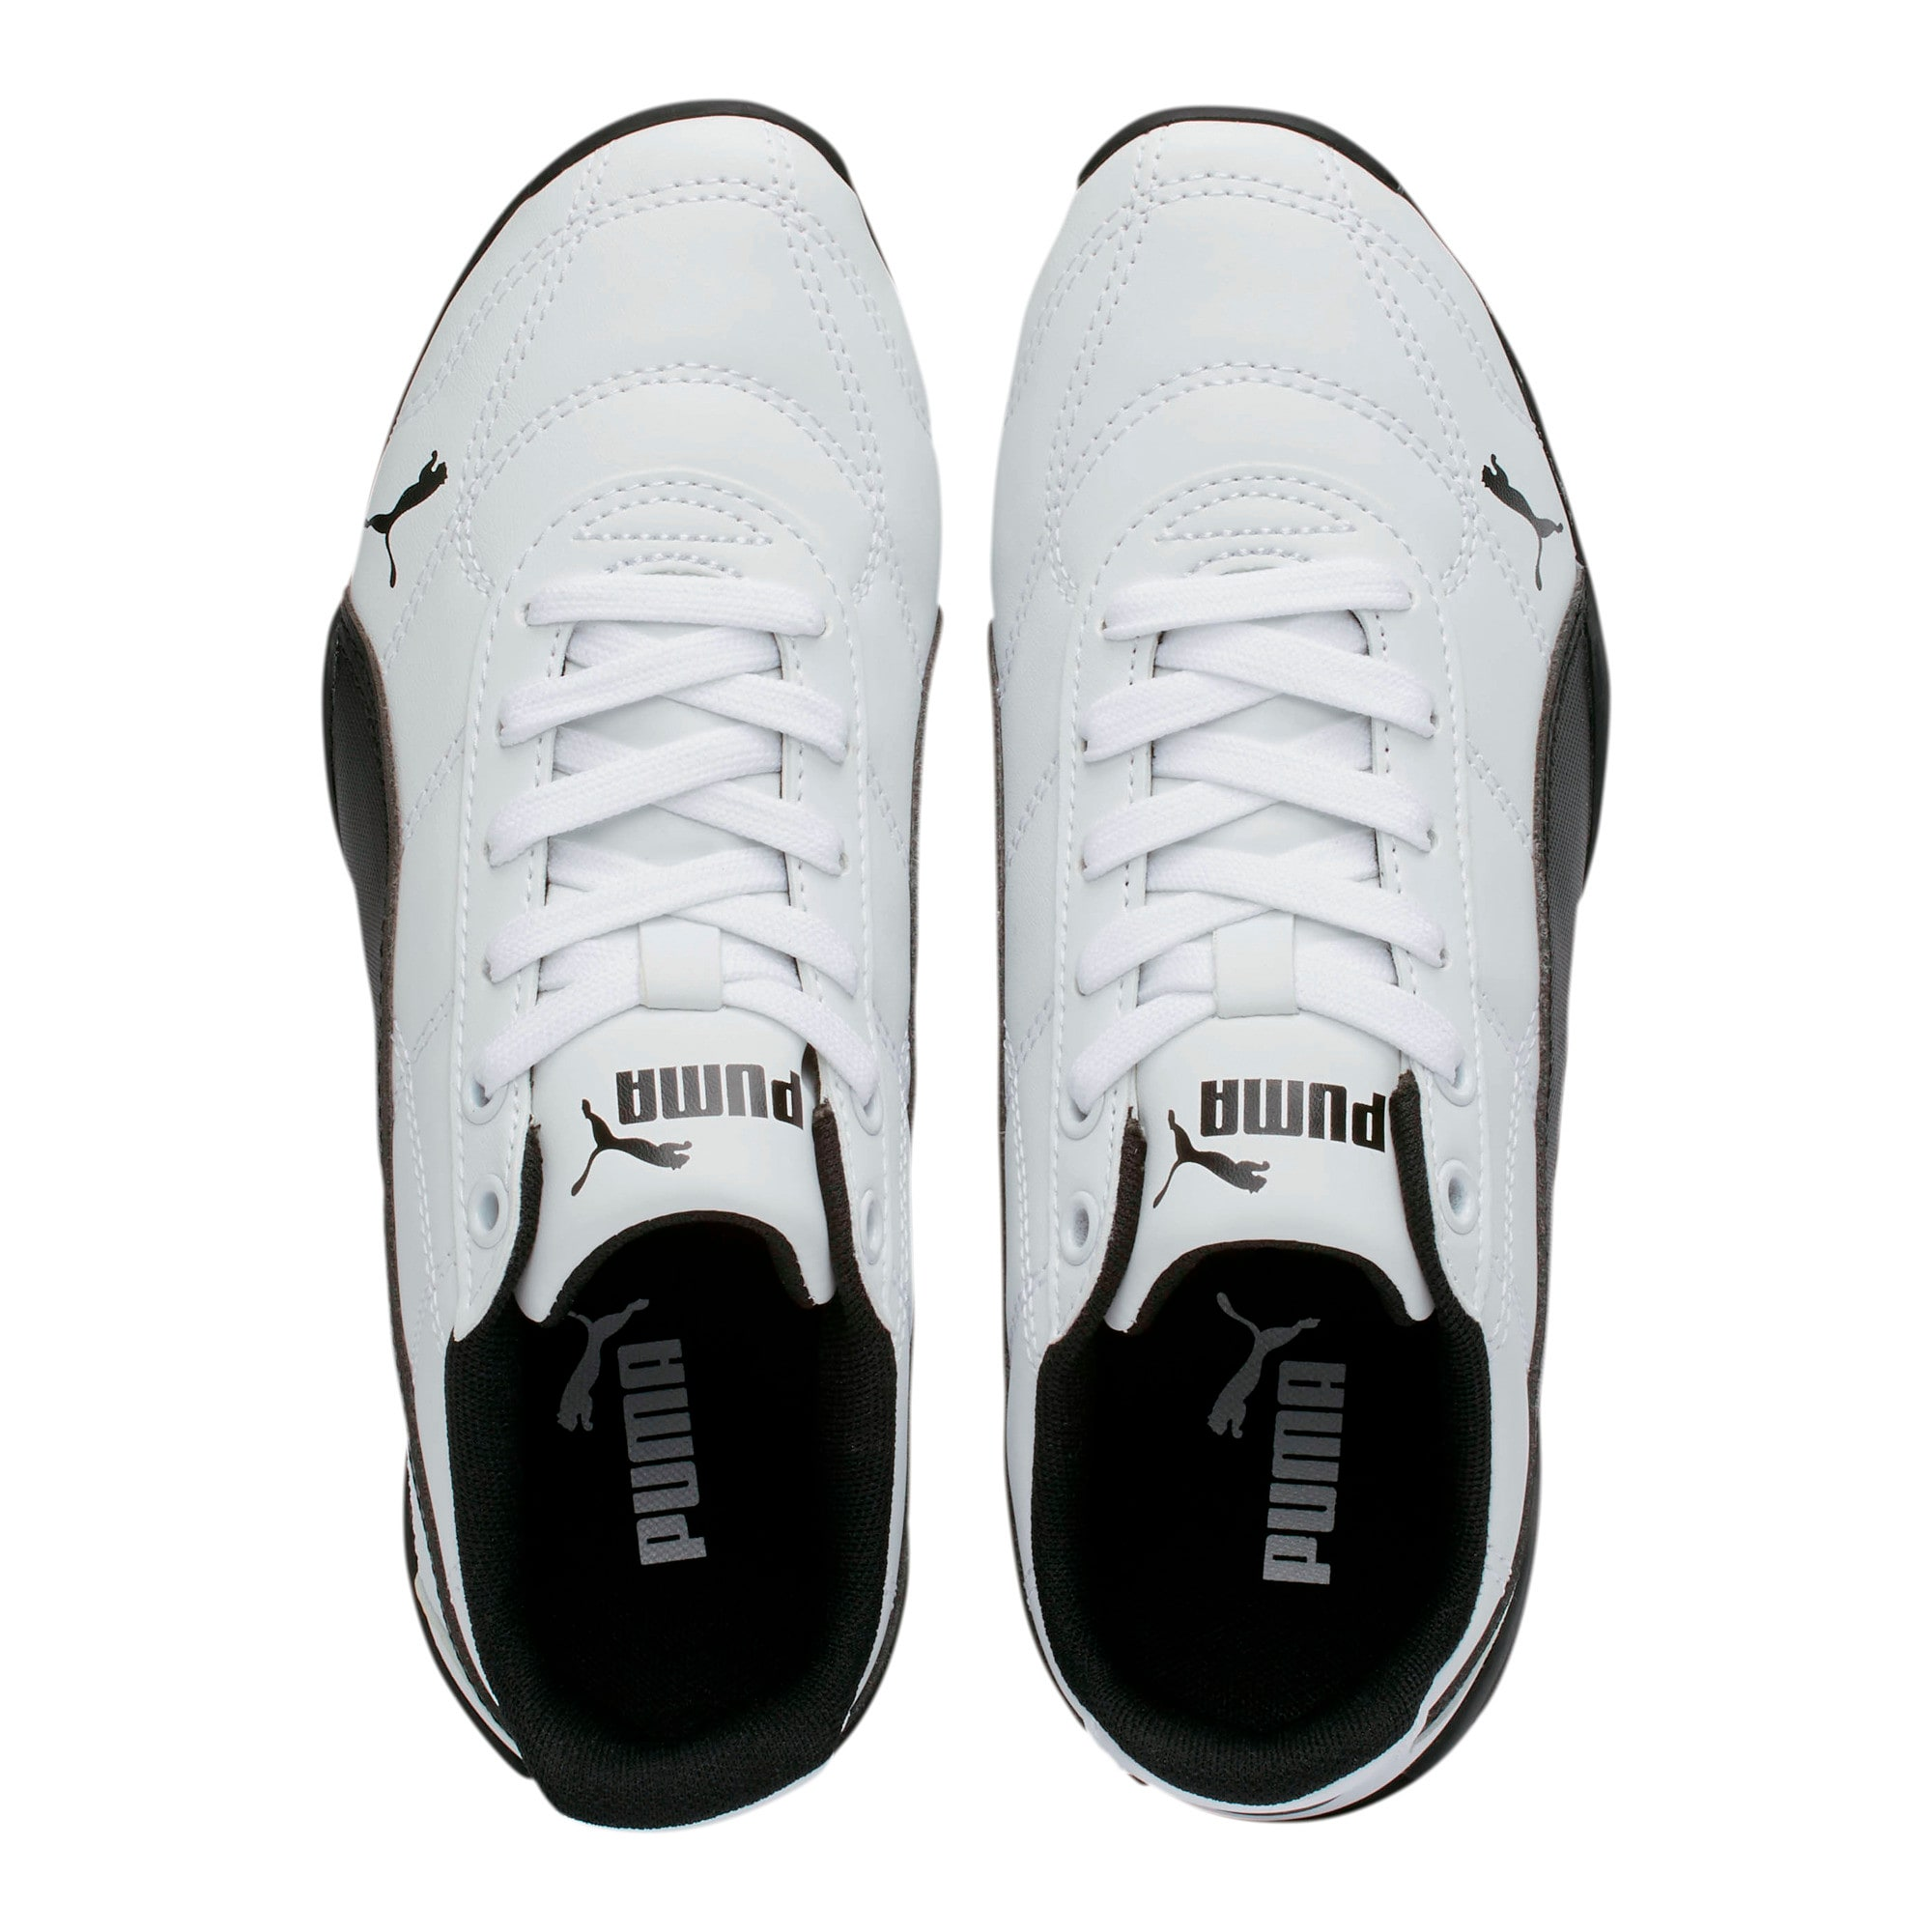 Thumbnail 6 of Tune Cat 3 Shoes JR, Puma White-Puma Black, medium